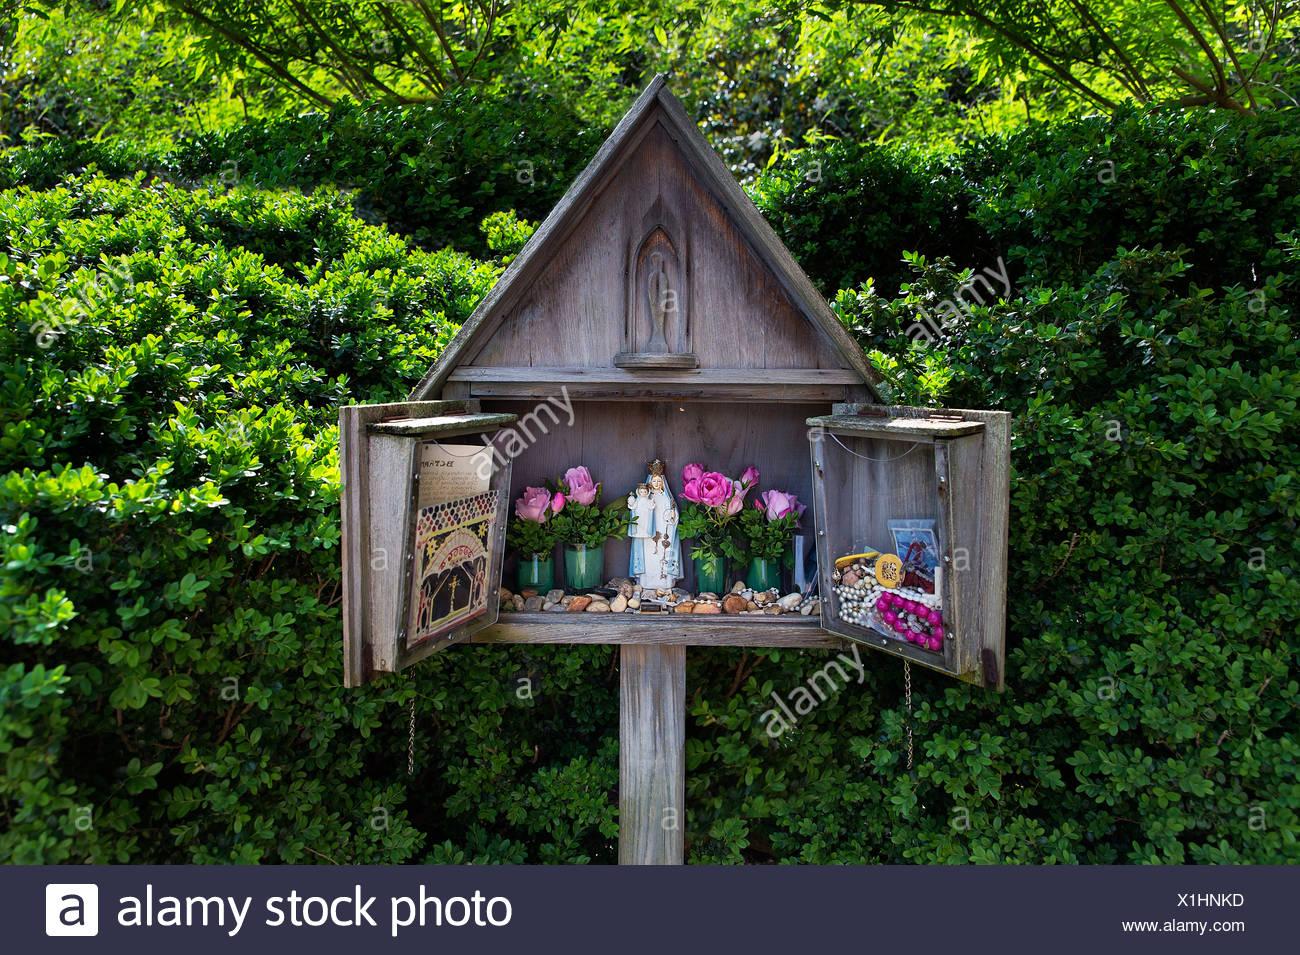 Small shrine dedicated to the Virgin Mary, St Mary's Catholic Church, Annapolis, Maryland, USA - Stock Image